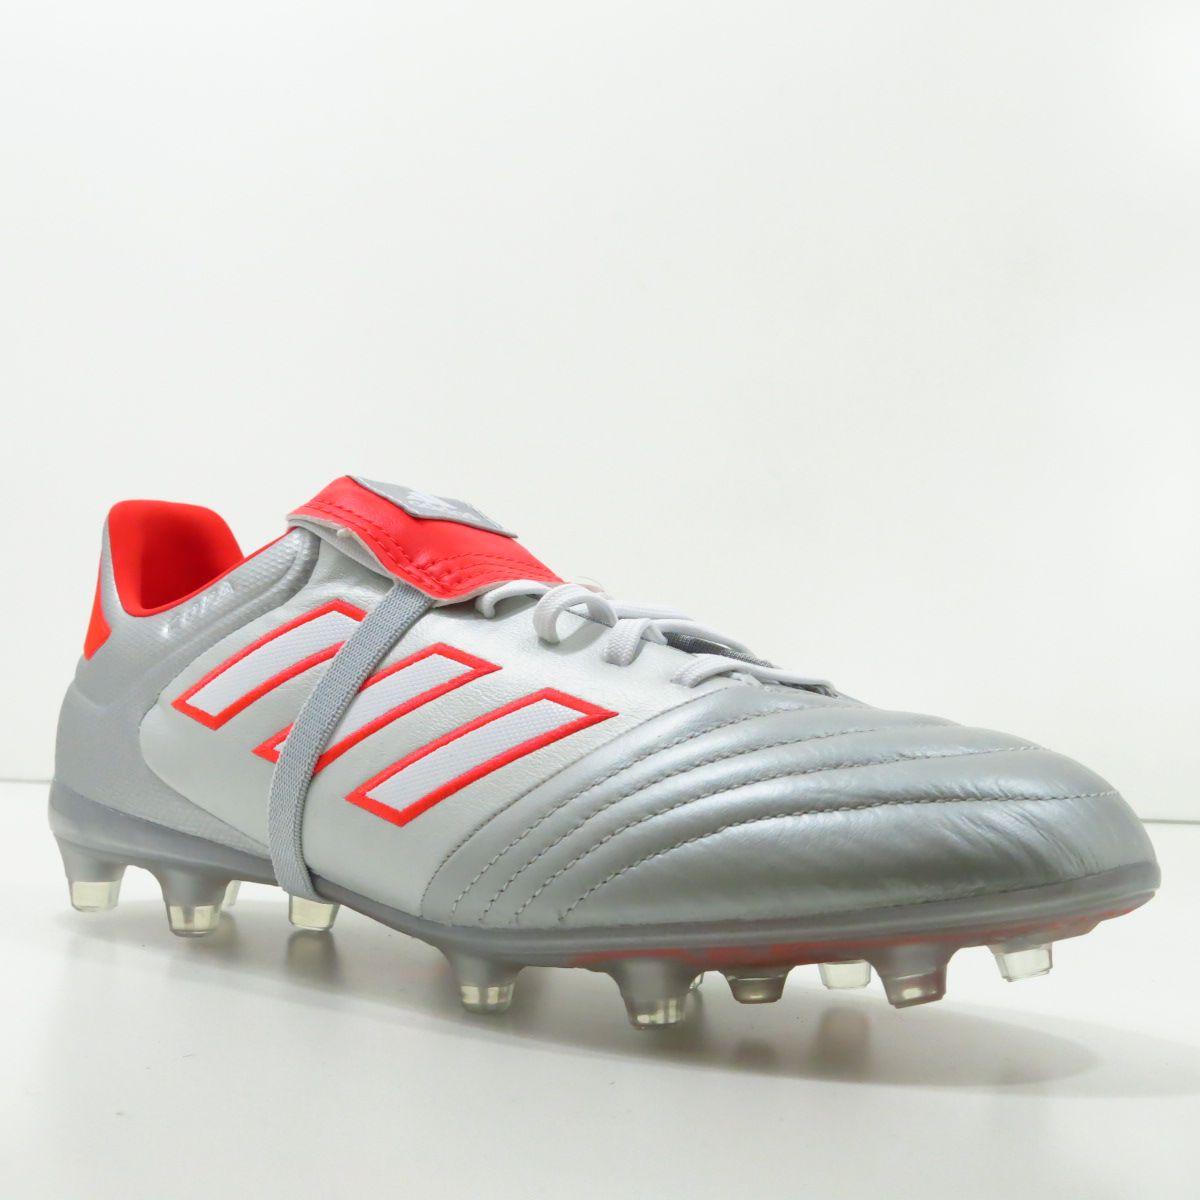 Chuteira Adidas Copa Gloro 17.2 FG - Couro